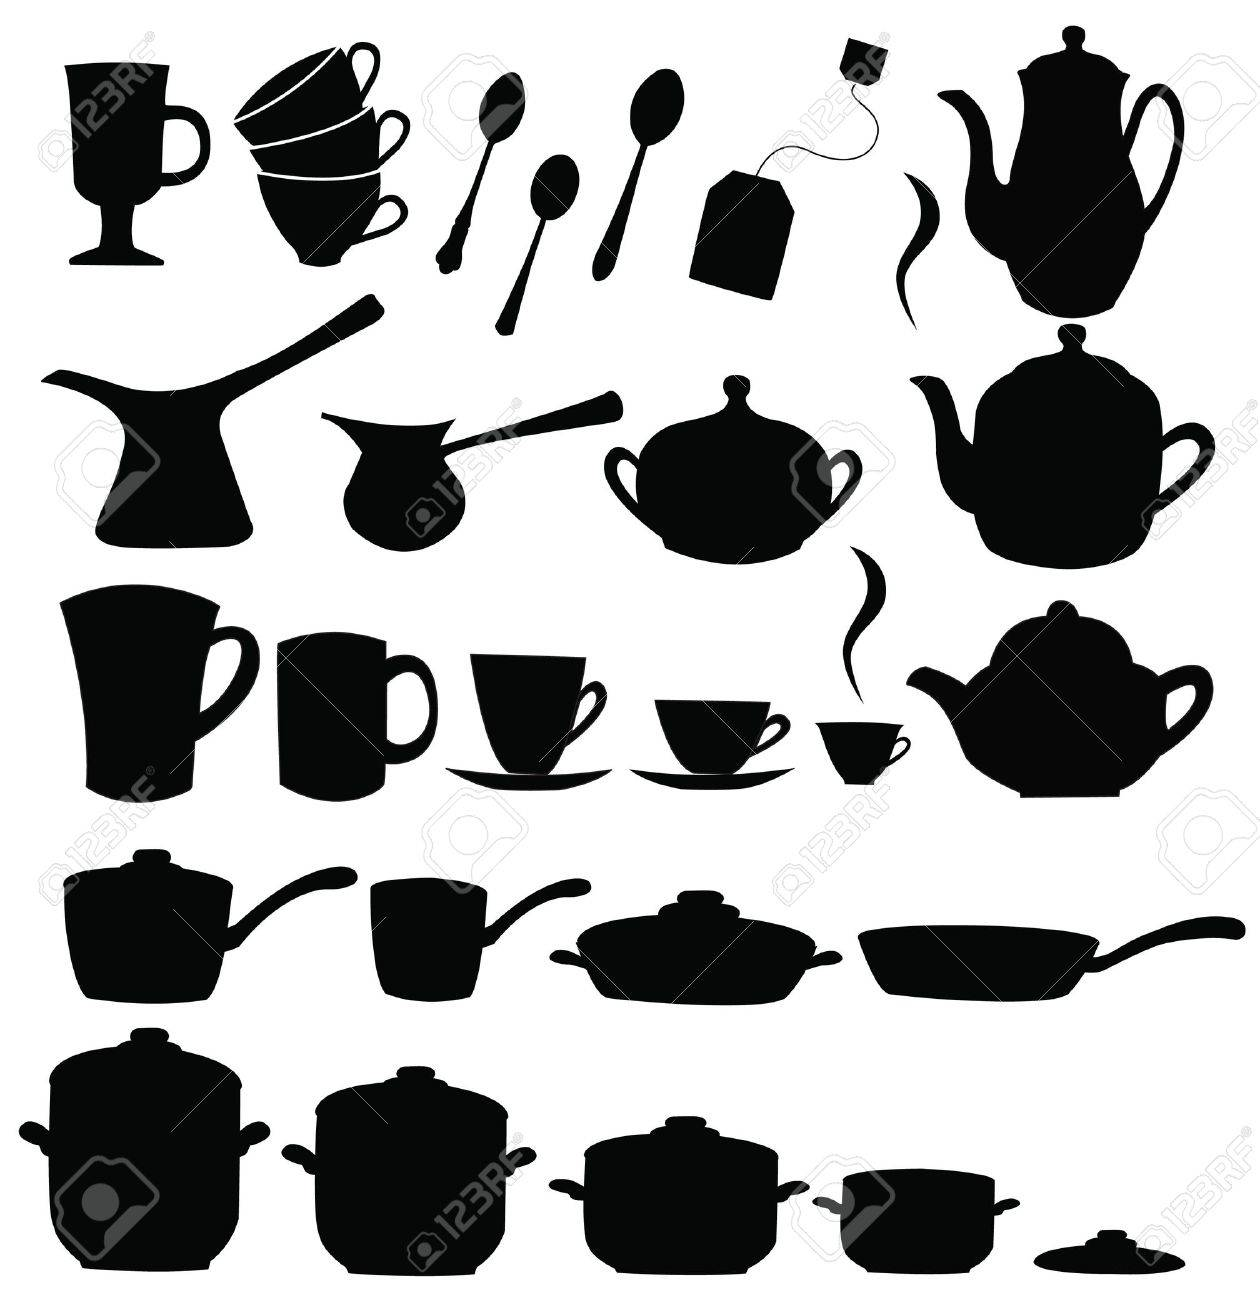 Tea, coffee ans pot sets - 11548731